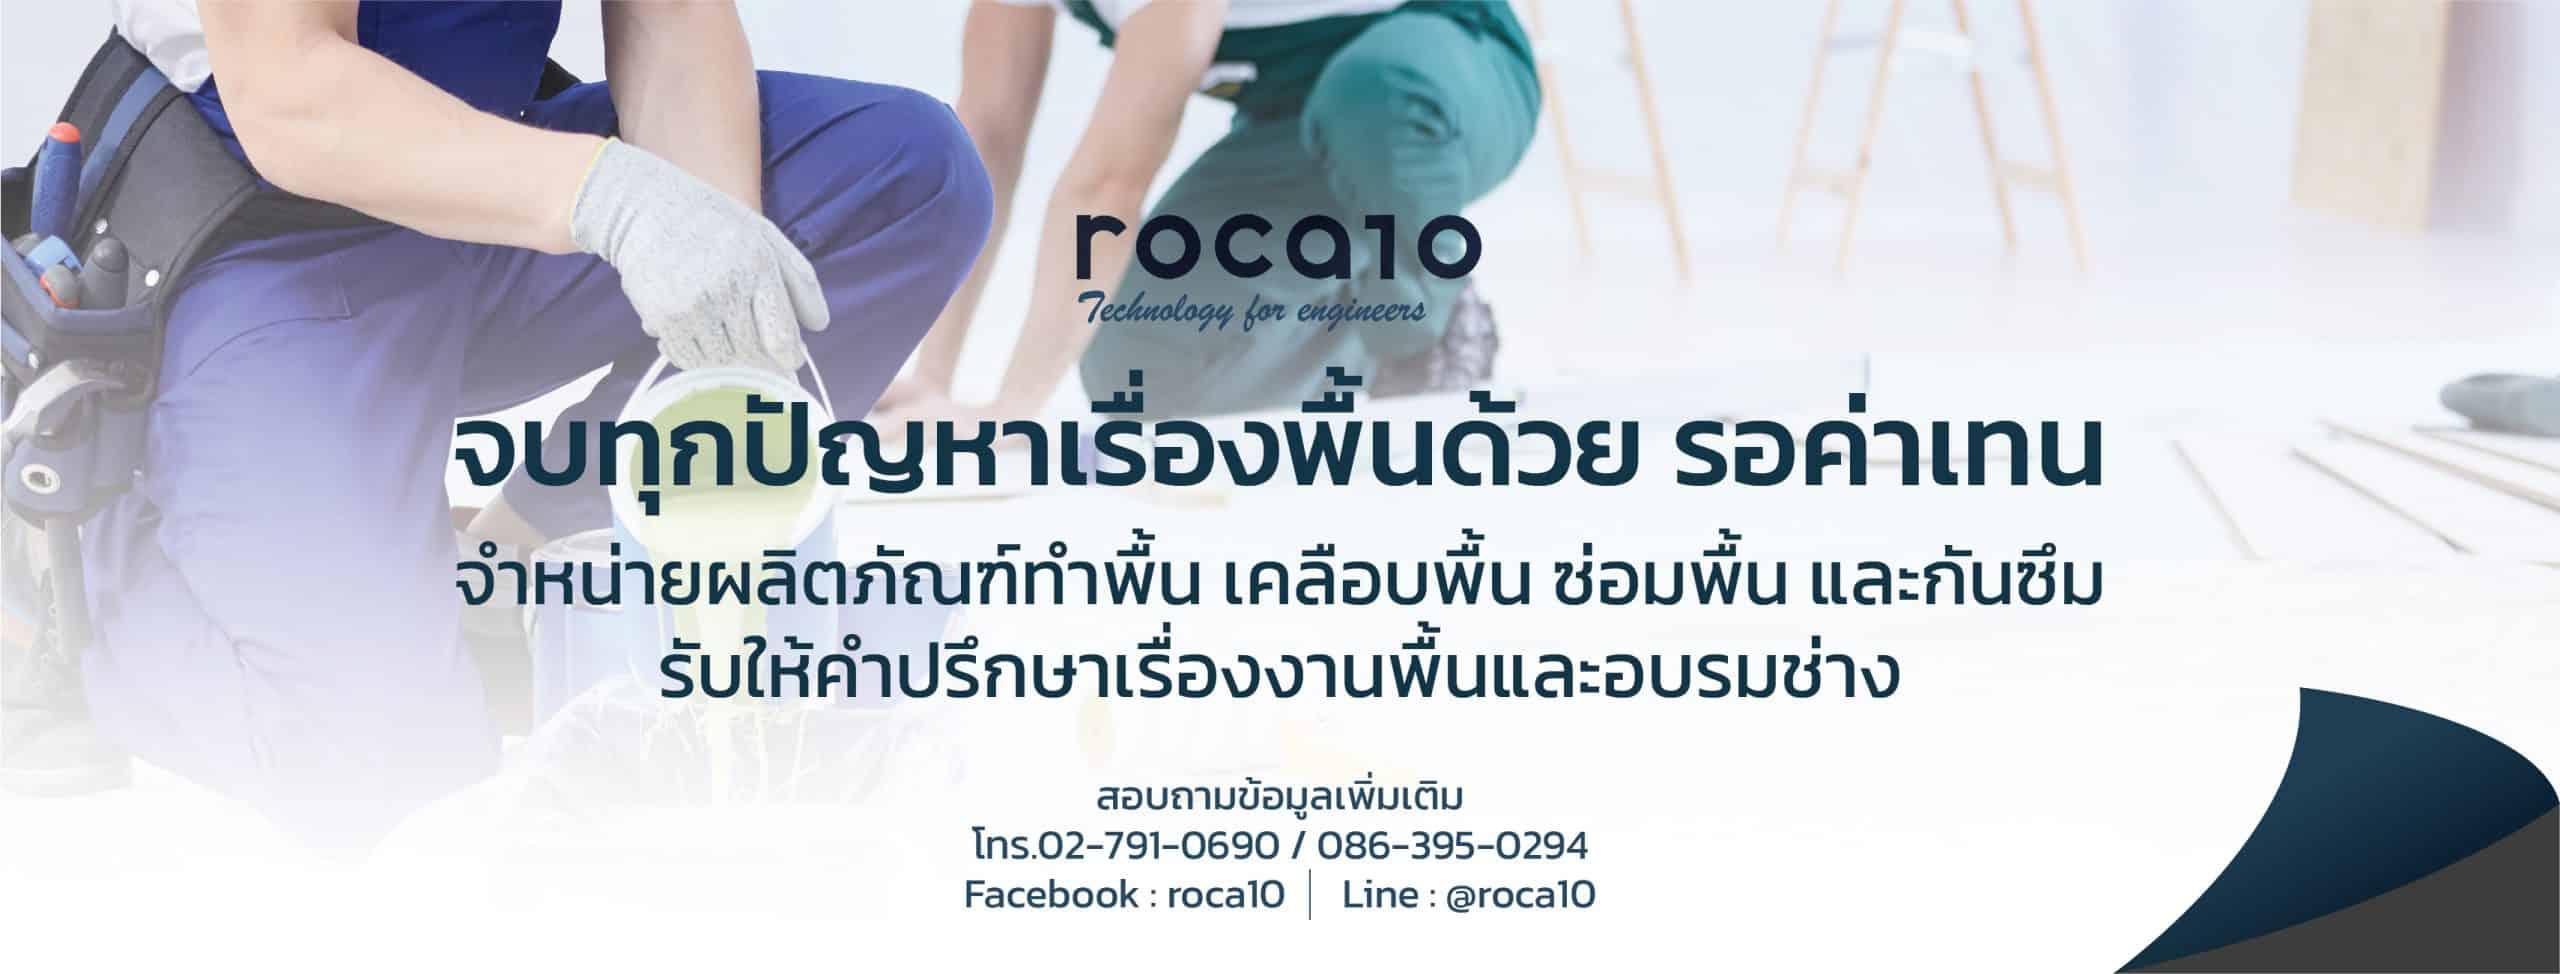 Roca10_header